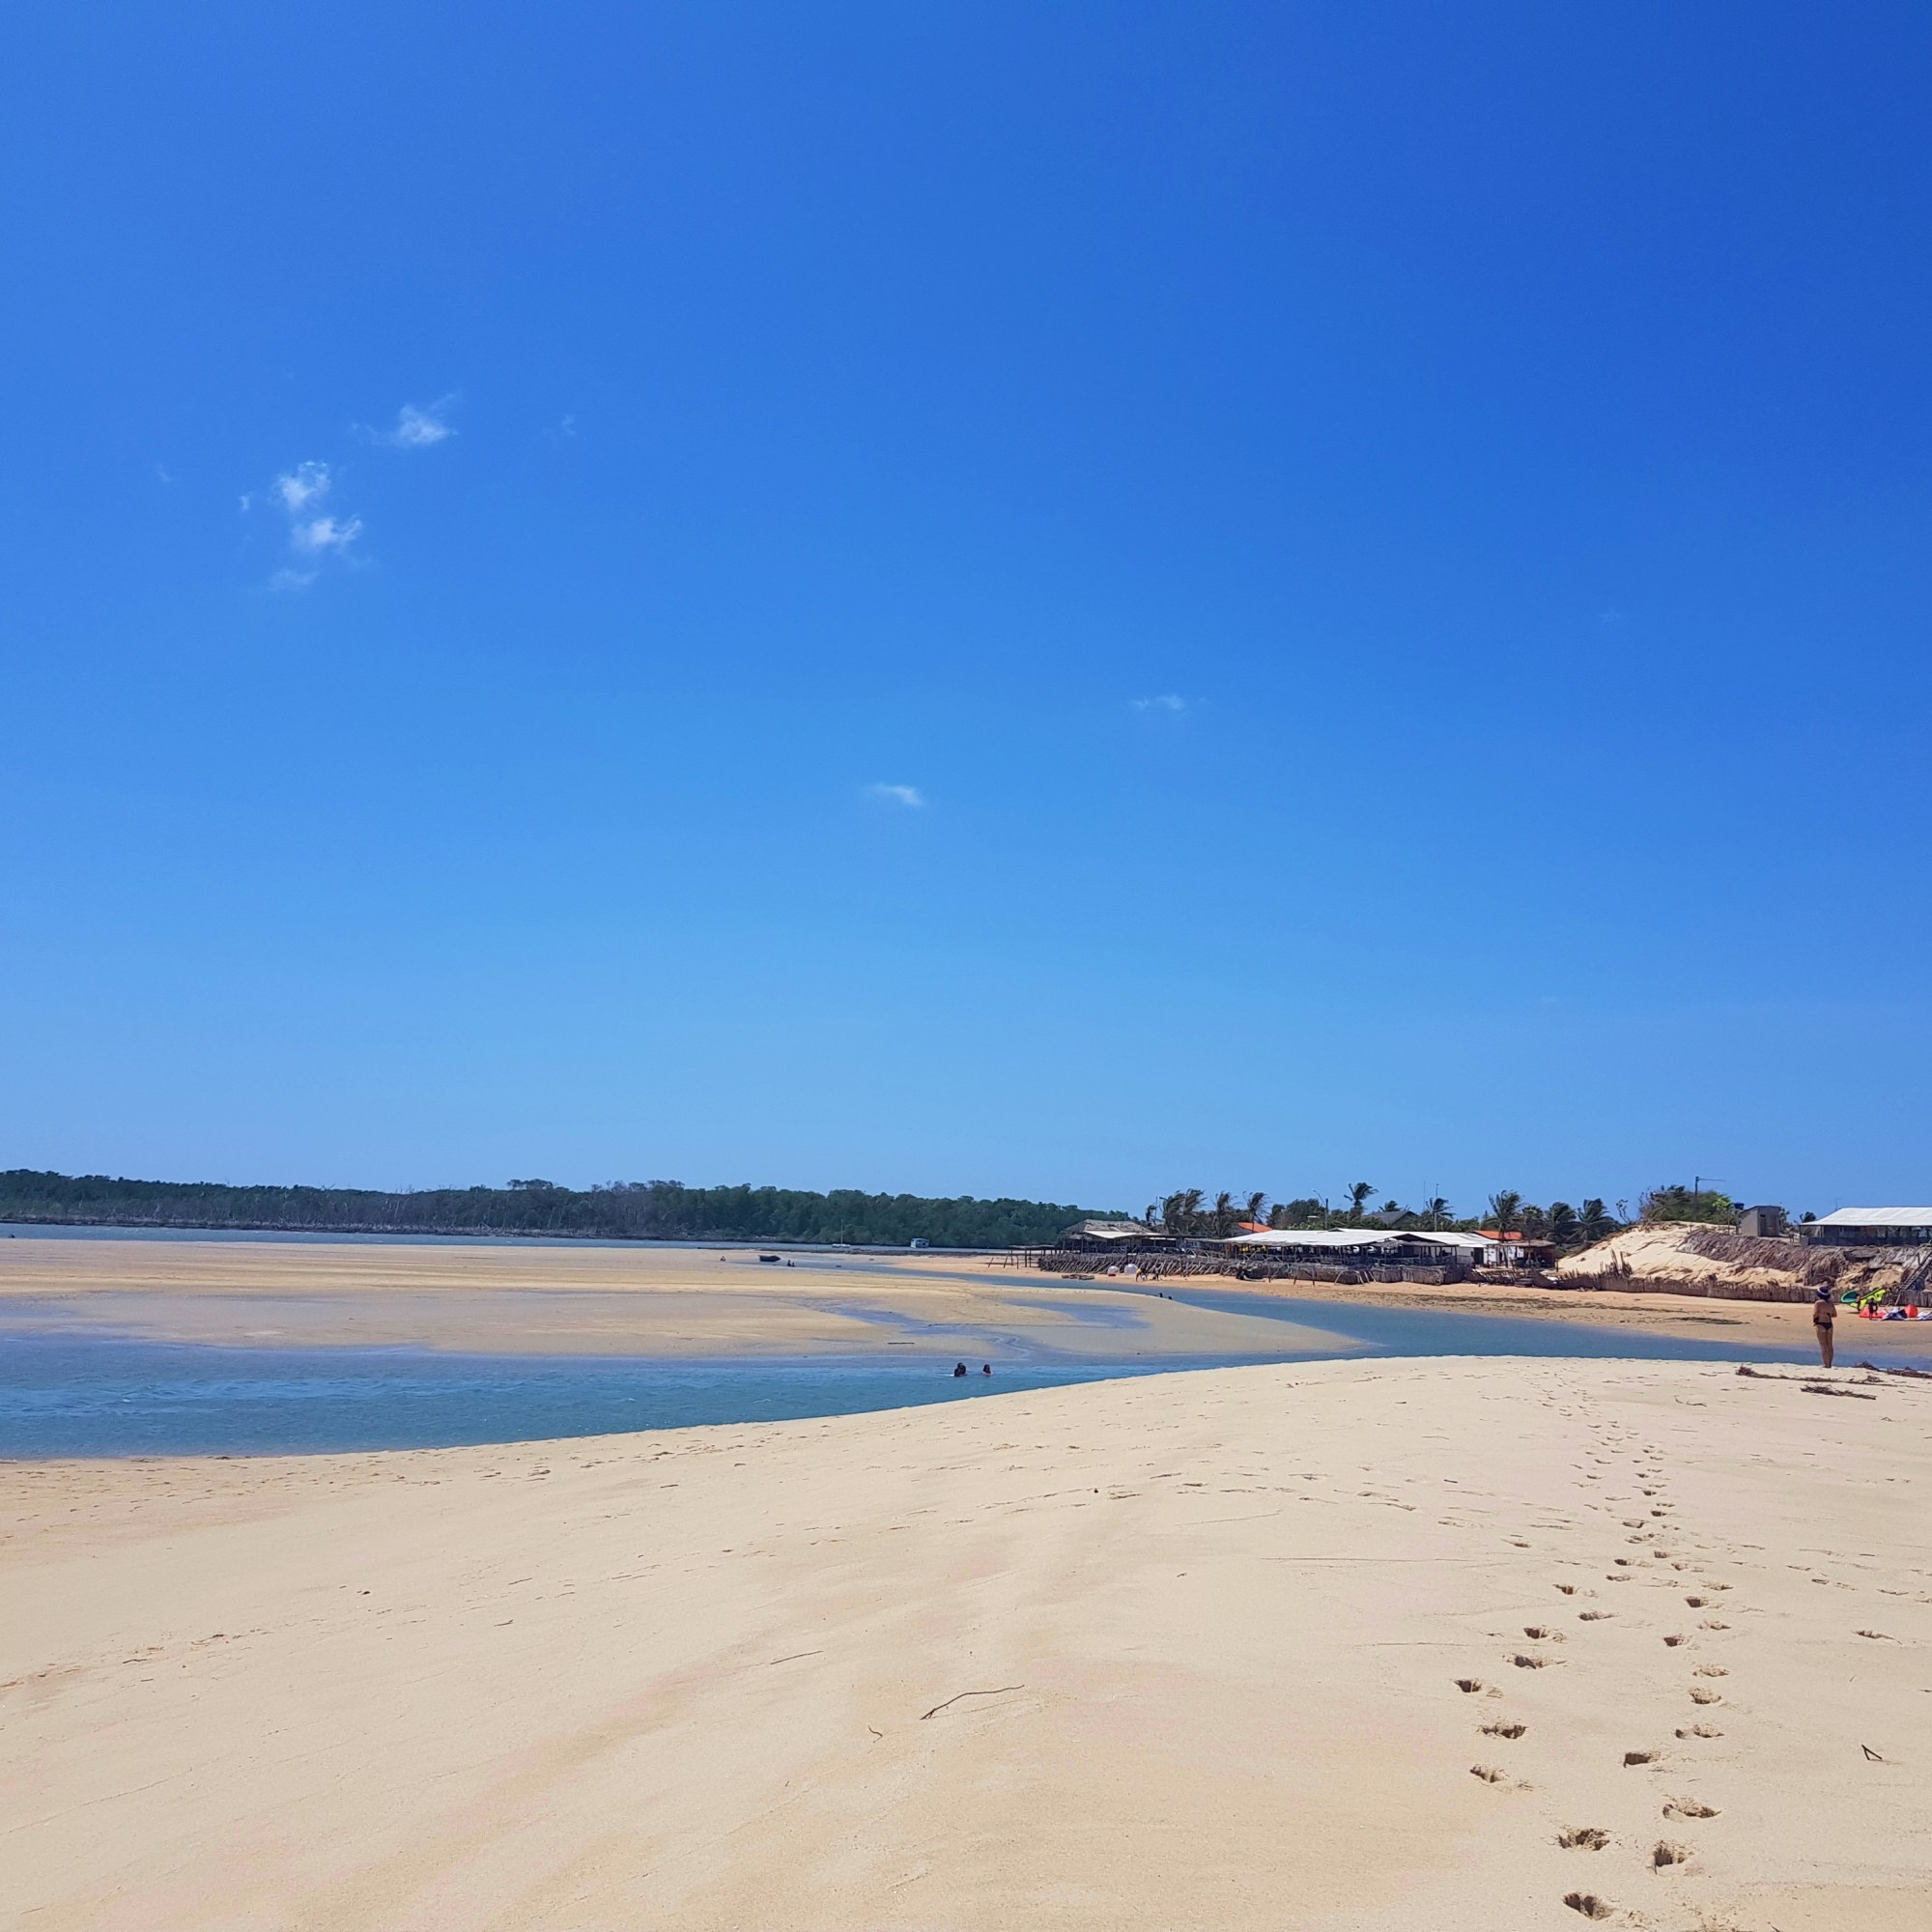 Plage de Macapa spot de kitesurf, kitetrip Brésil